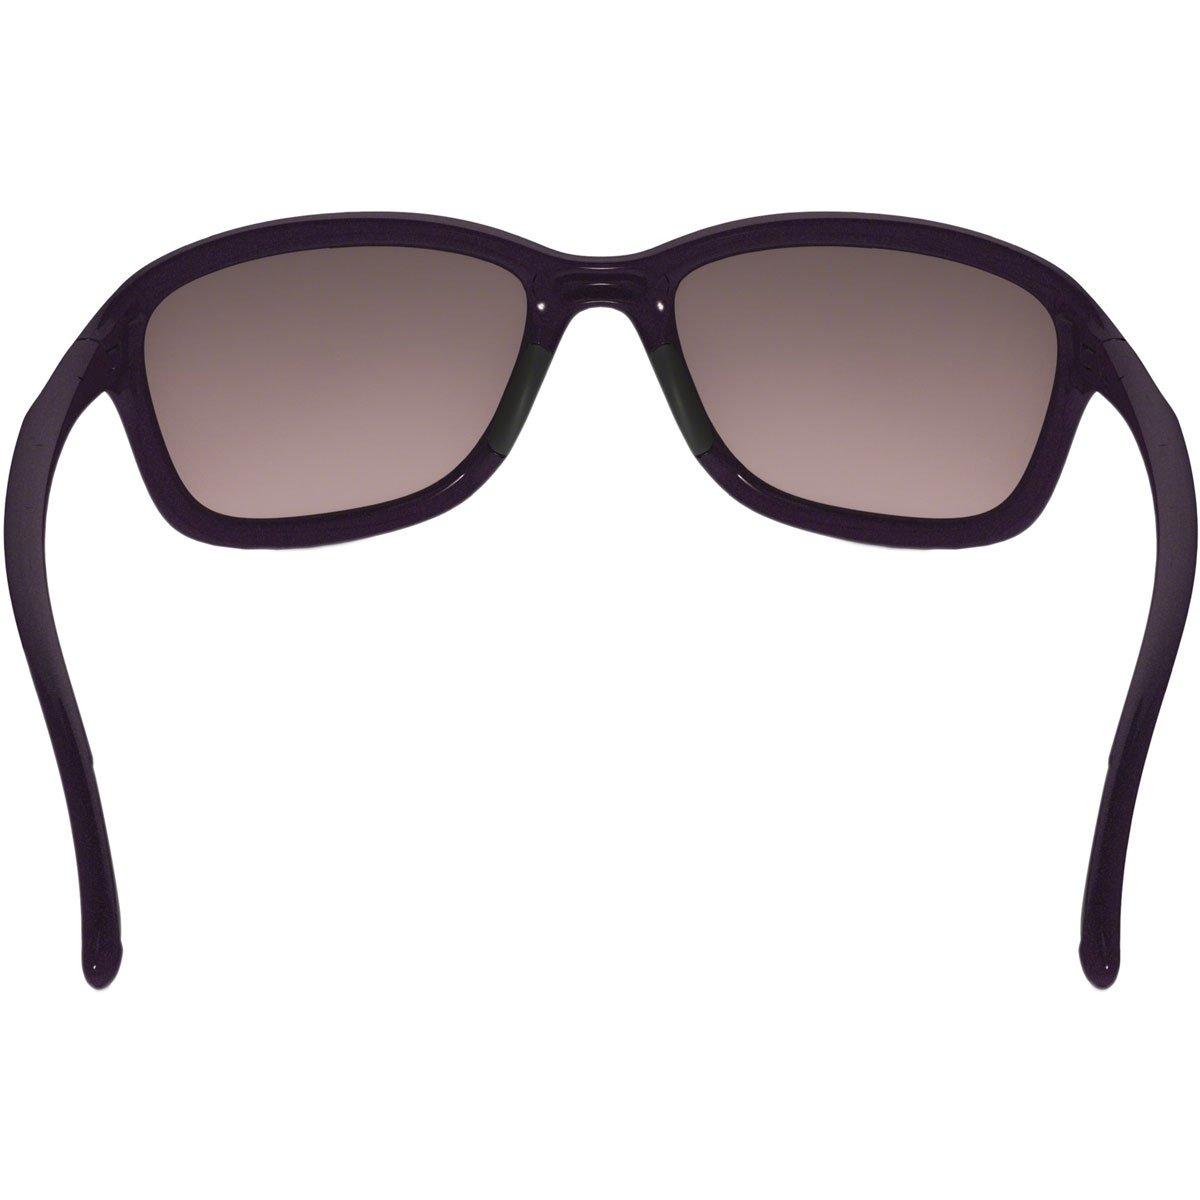 b02021f83b Oakley Women s She s Unstoppable Round Sunglasses